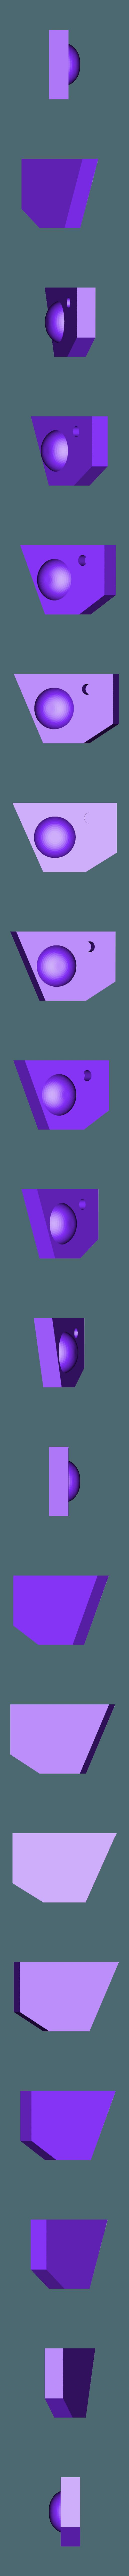 Side_Detail_1_Right.stl Télécharger fichier STL gratuit Borderlands Bandit Room Clener Shotgun • Modèle pour impression 3D, Dsk